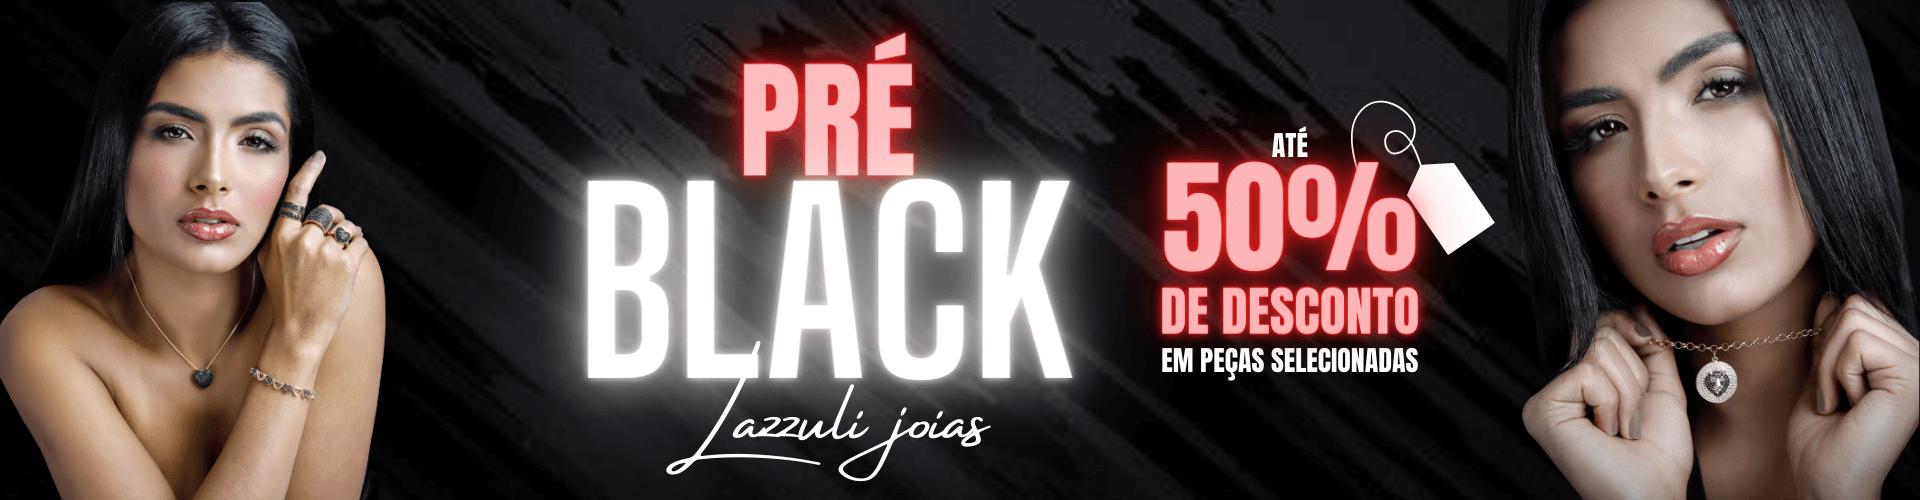 Pré Black Friday